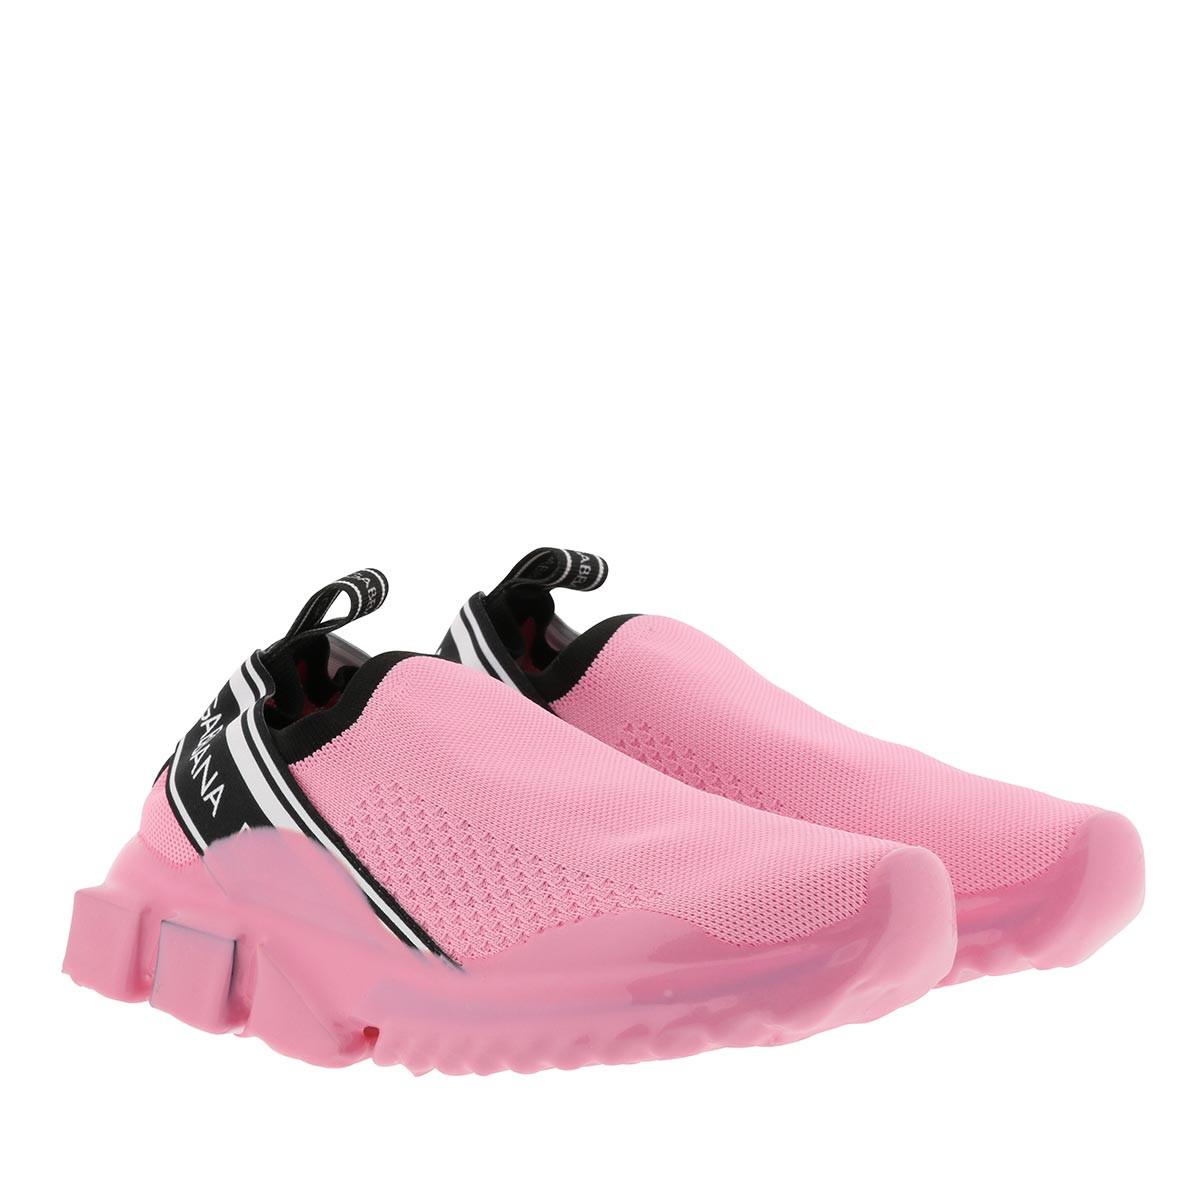 Dolce&Gabbana Sneakers - Sorrento Sneaker Melt Pink - in rosa - für Damen